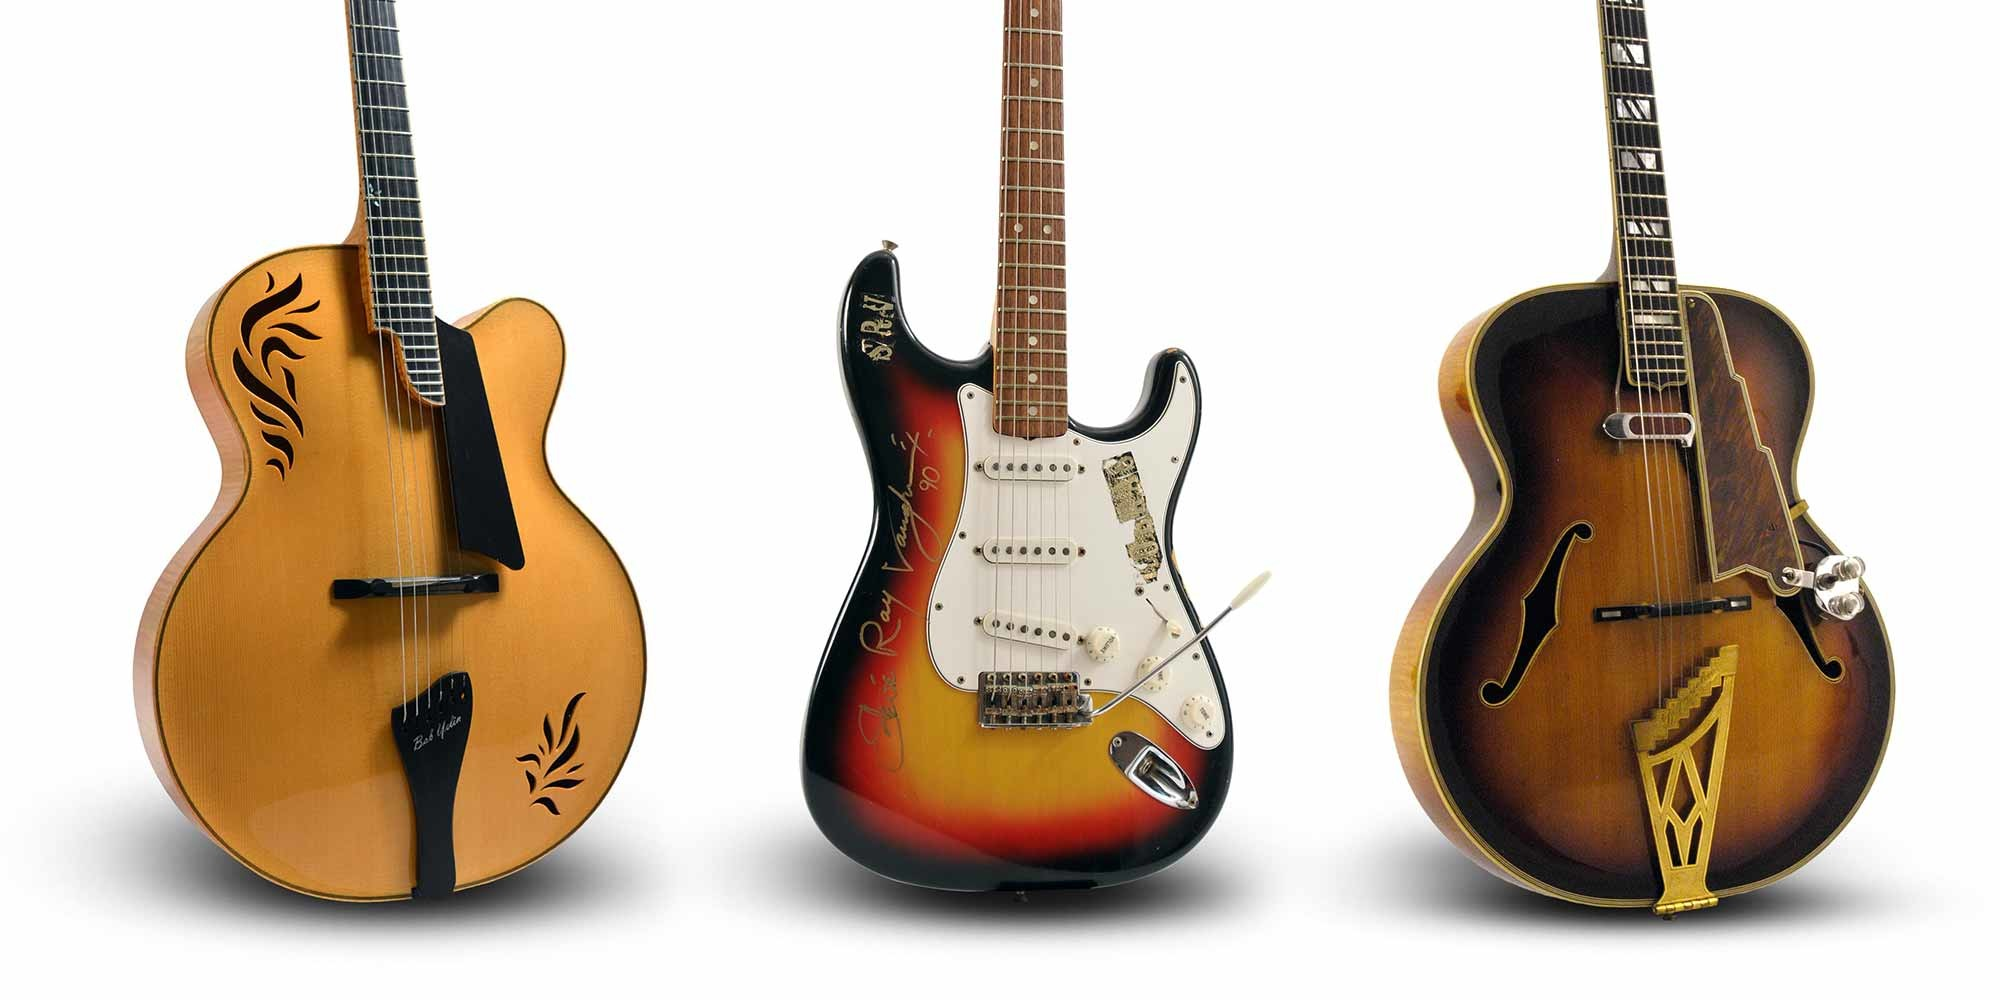 Guitars from SRV, EVH, Django Reinhardt and Others Hit